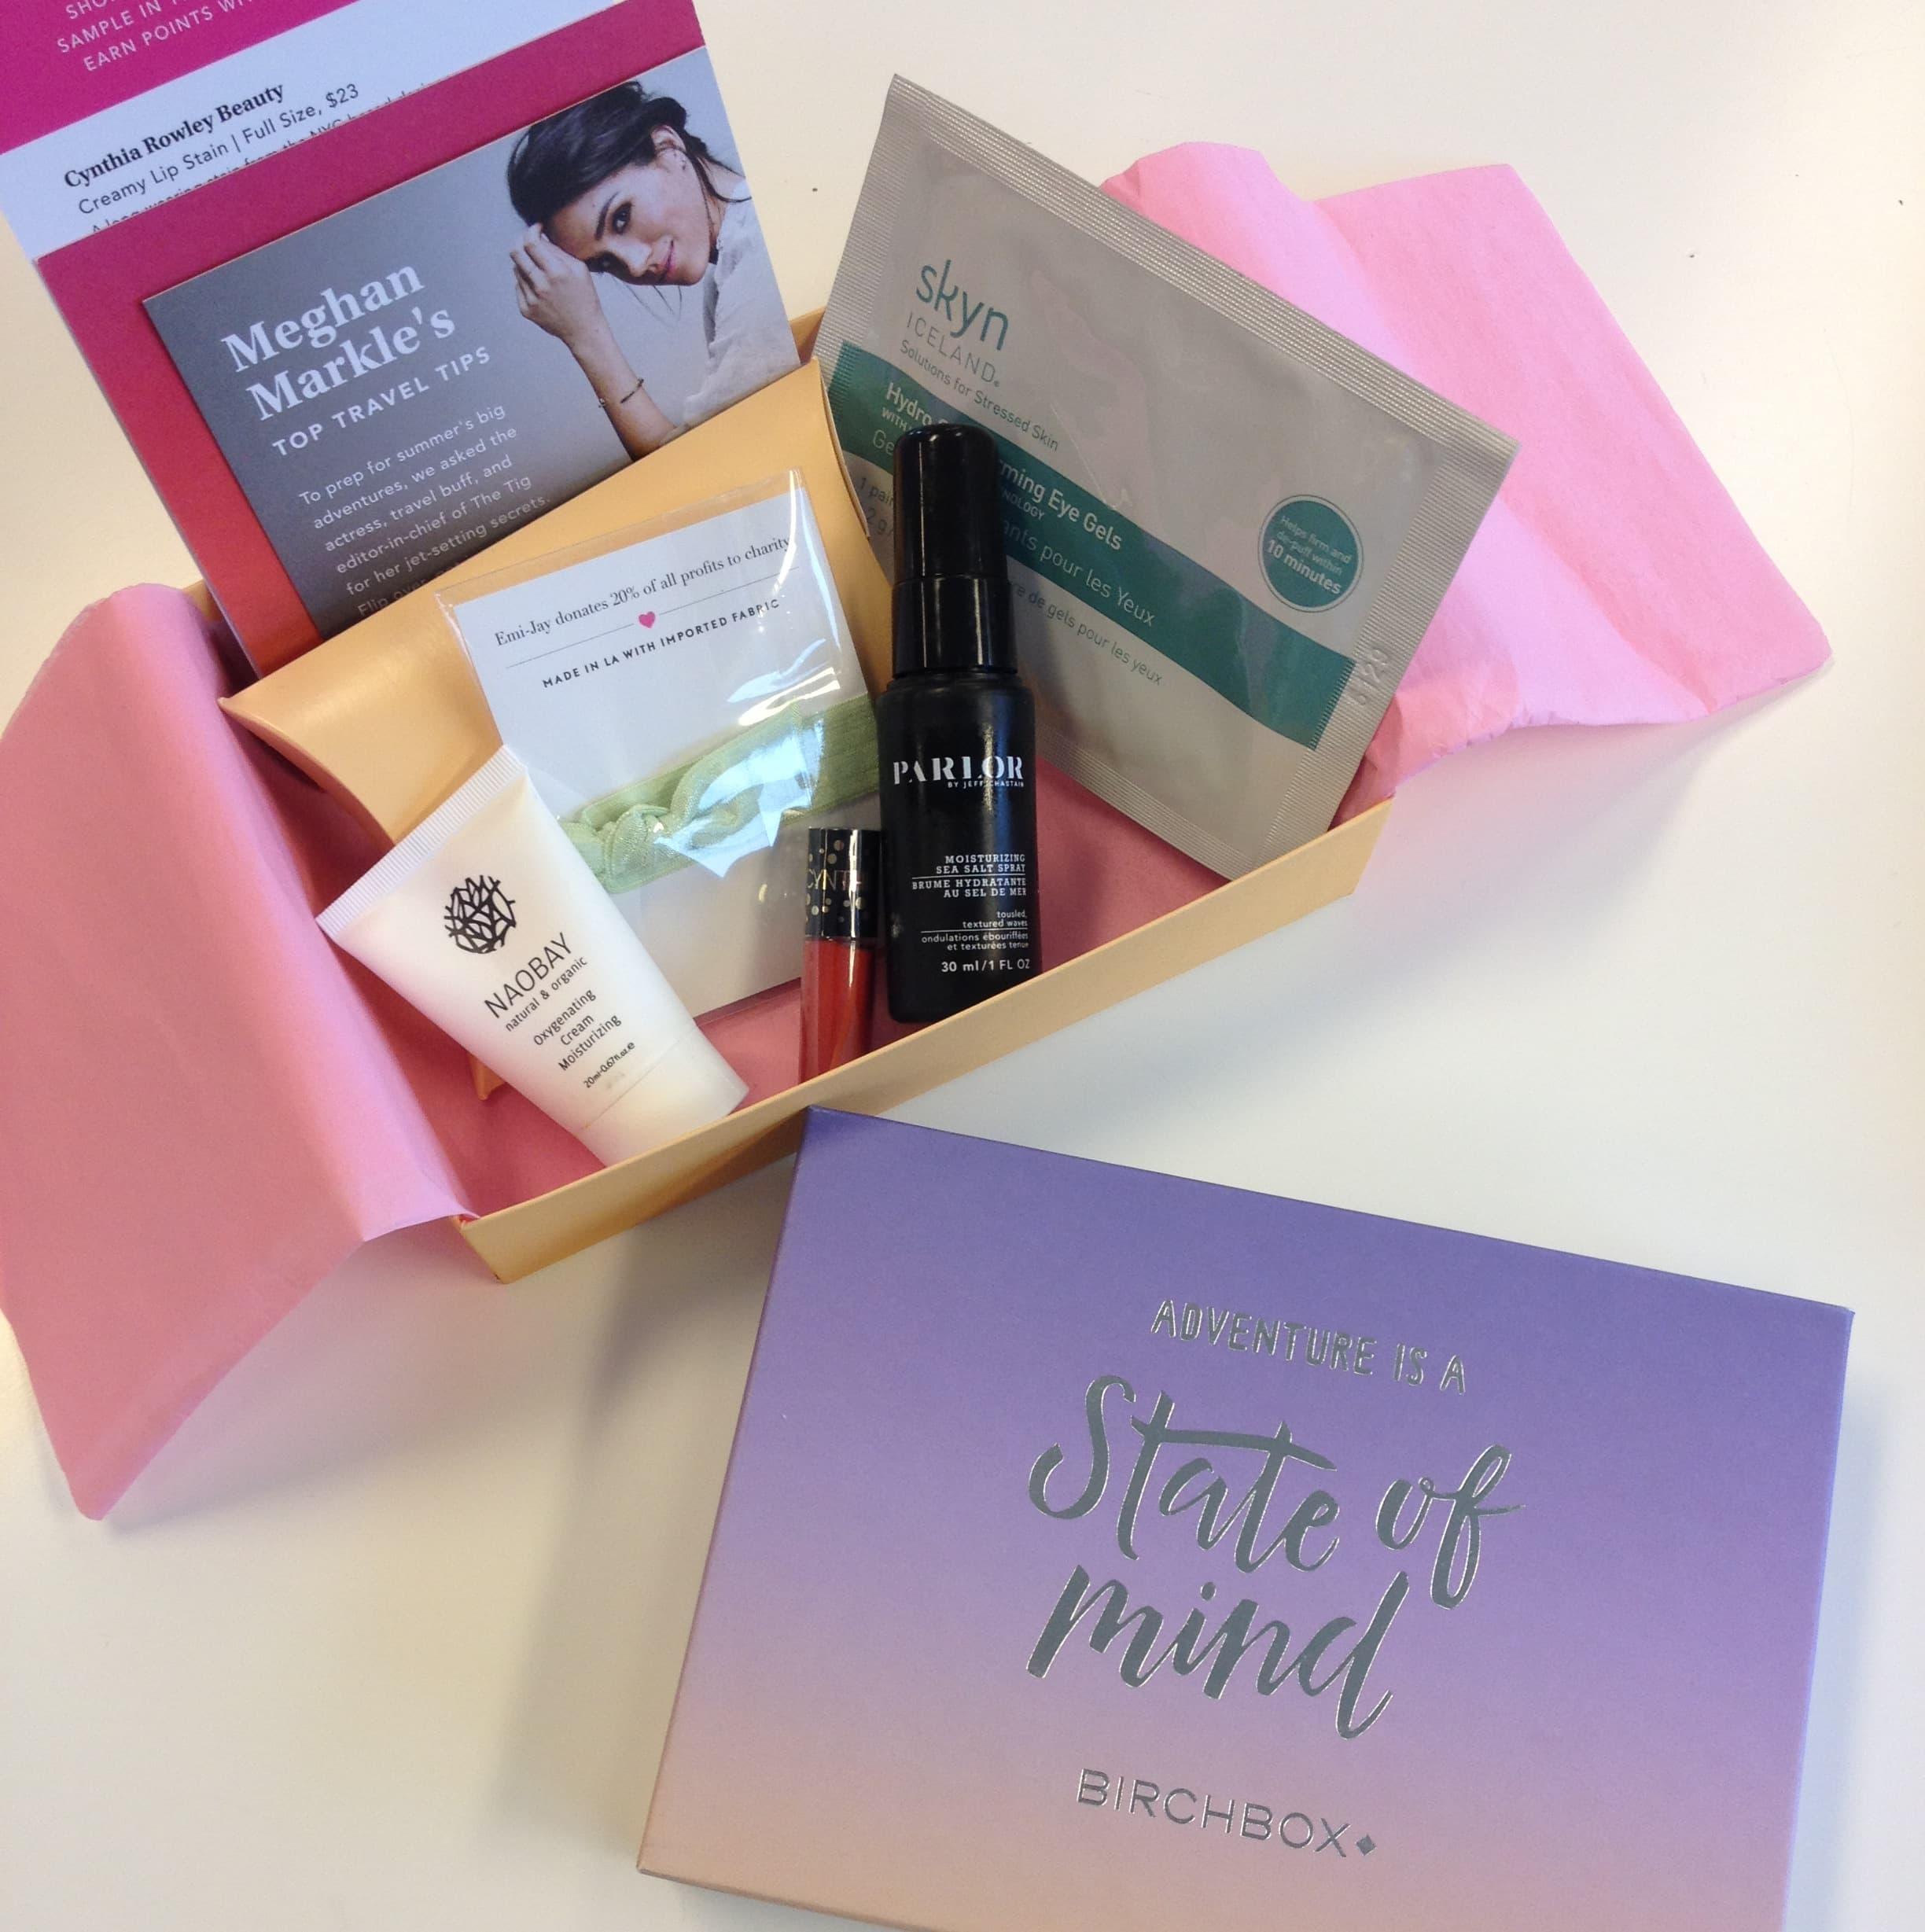 Meghan Markle's Birchbox travel box